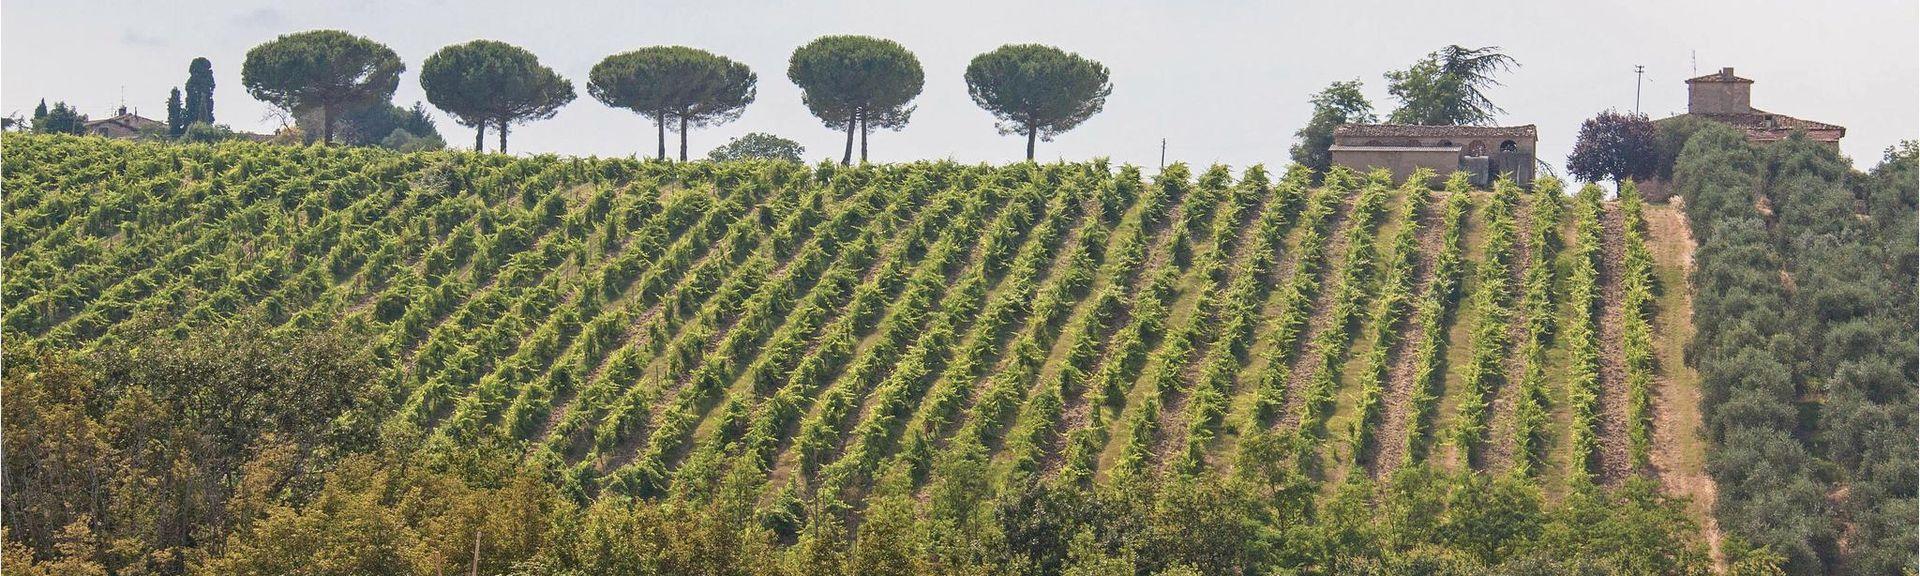 Greve in Chianti, Toscana, Italien